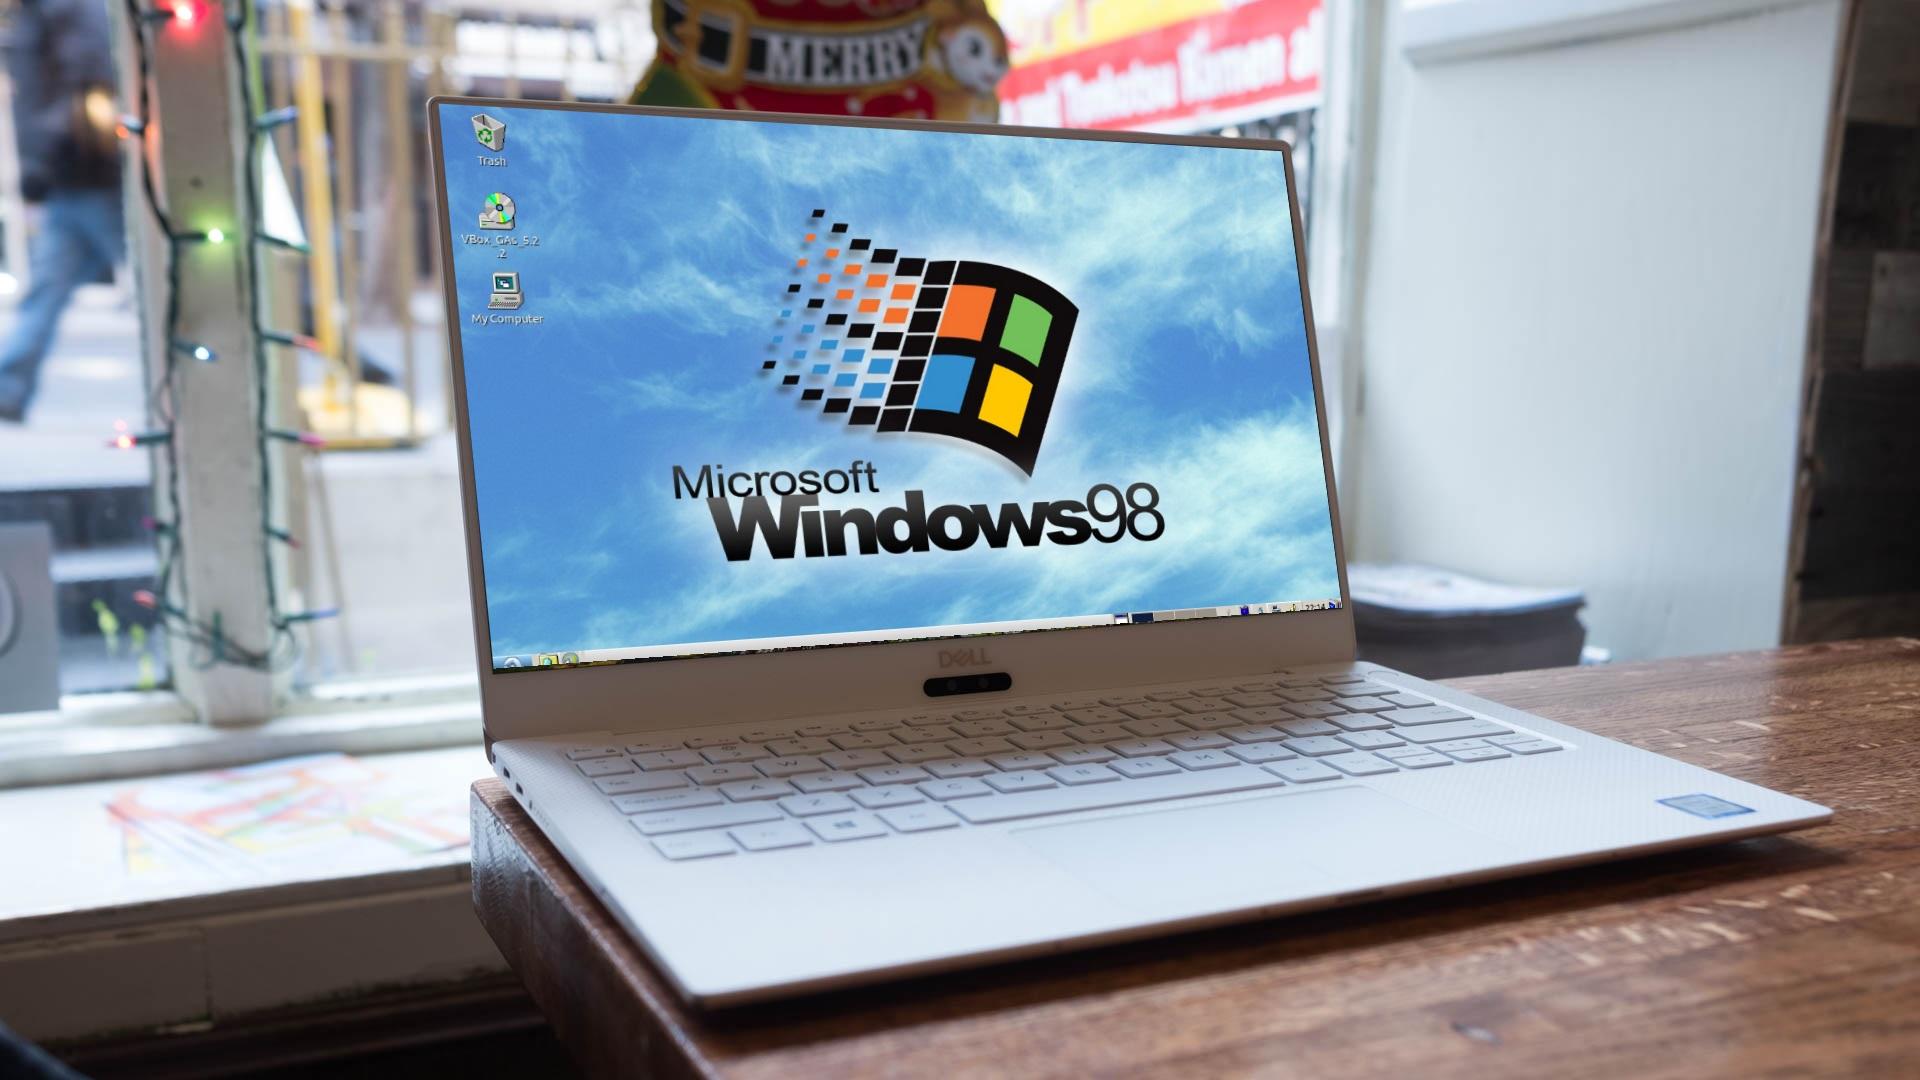 Best Laptop for Windows 98 Games